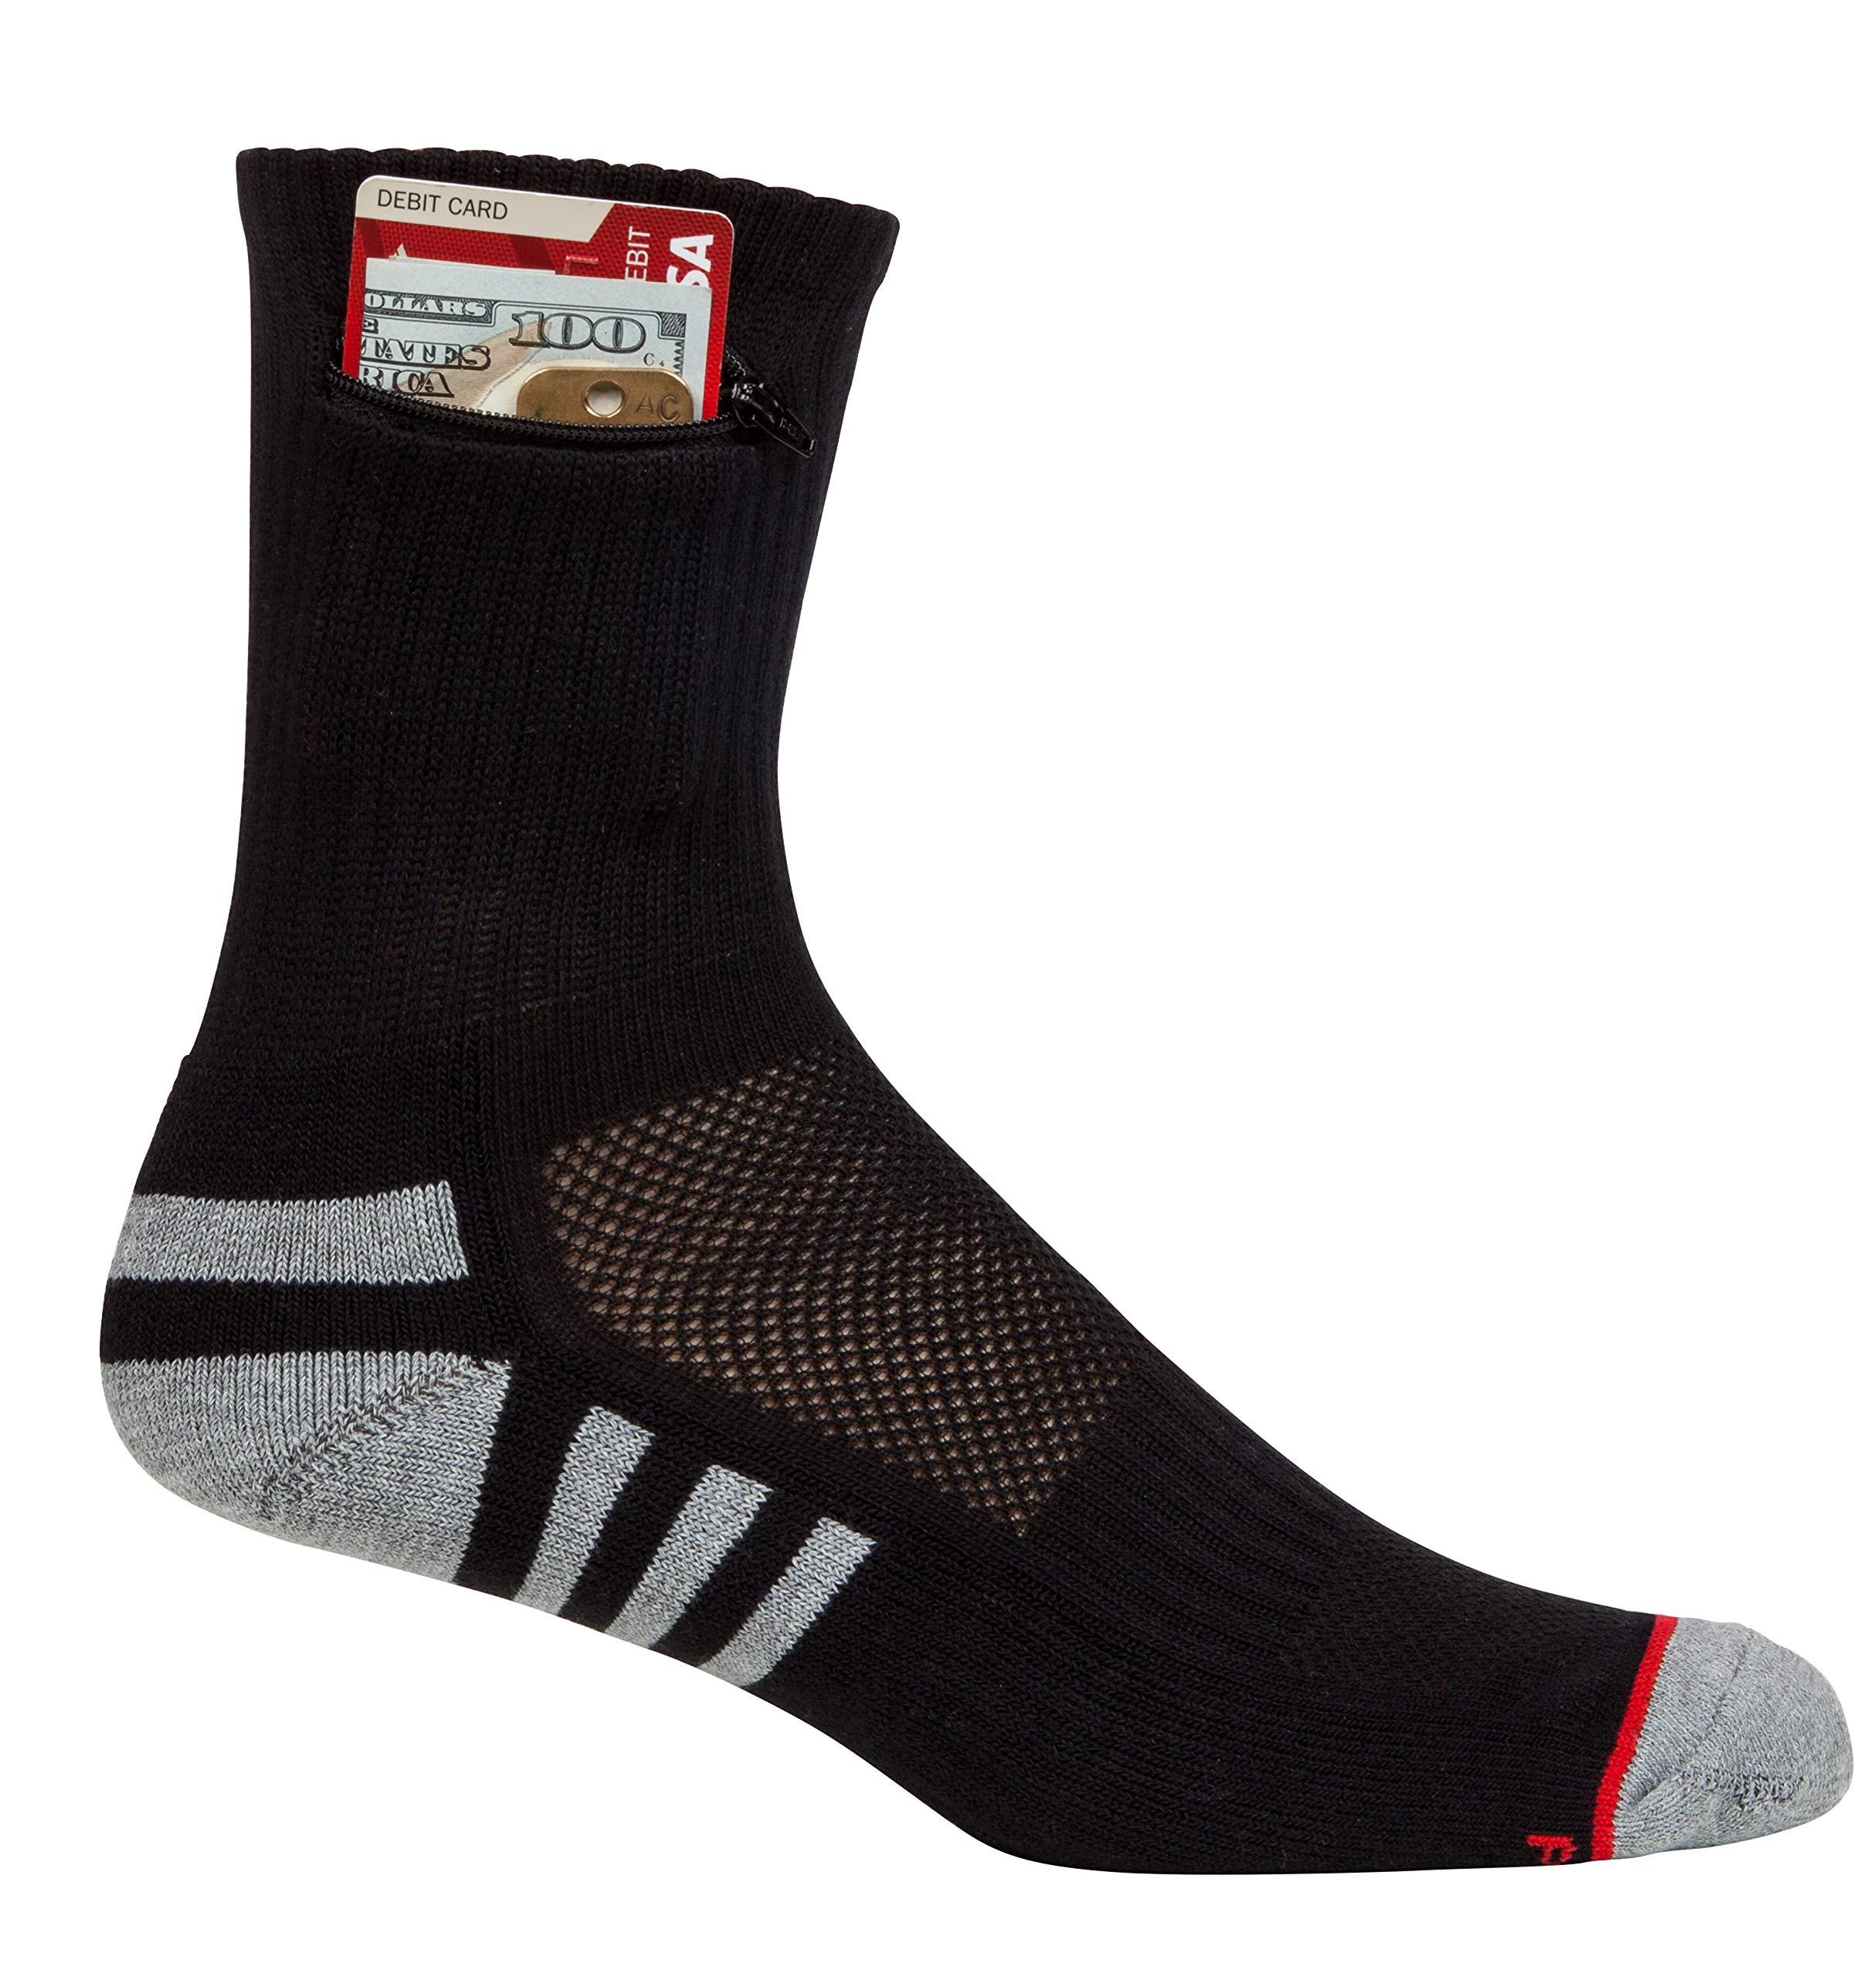 Pocket Socks Men's Athletic Travel Ankle Socks with Hidden Zip Security Pocket for ID, Key or Cash Money, One Size Fits Most (Black, 1) by Pocket Socks